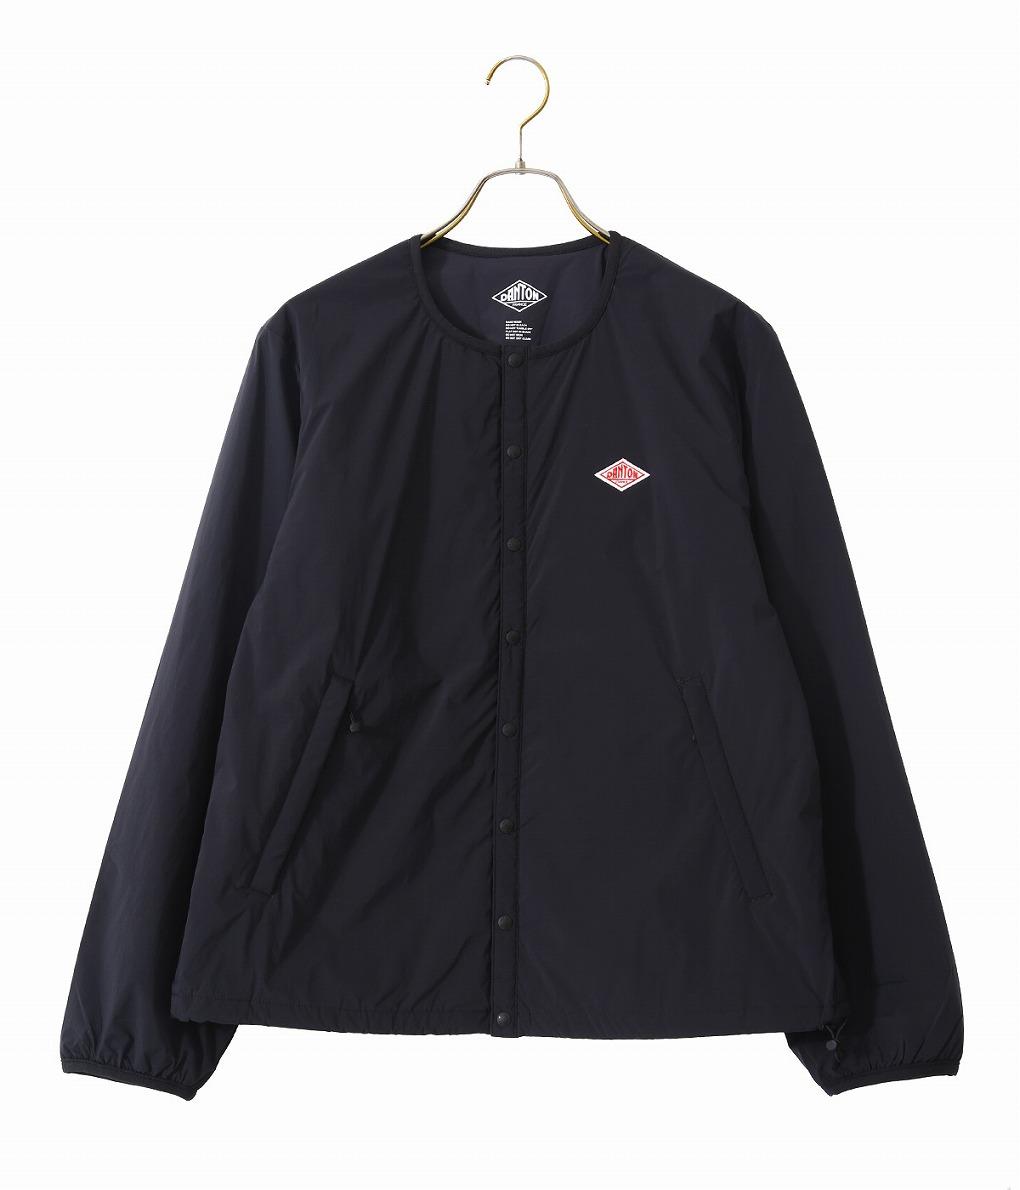 DANTON / ダントン : 【メンズ】INSULATION JACKET / 全3色 : コットン ポップリン シャツ 半袖シャツ : JD-8885-SET【STD】